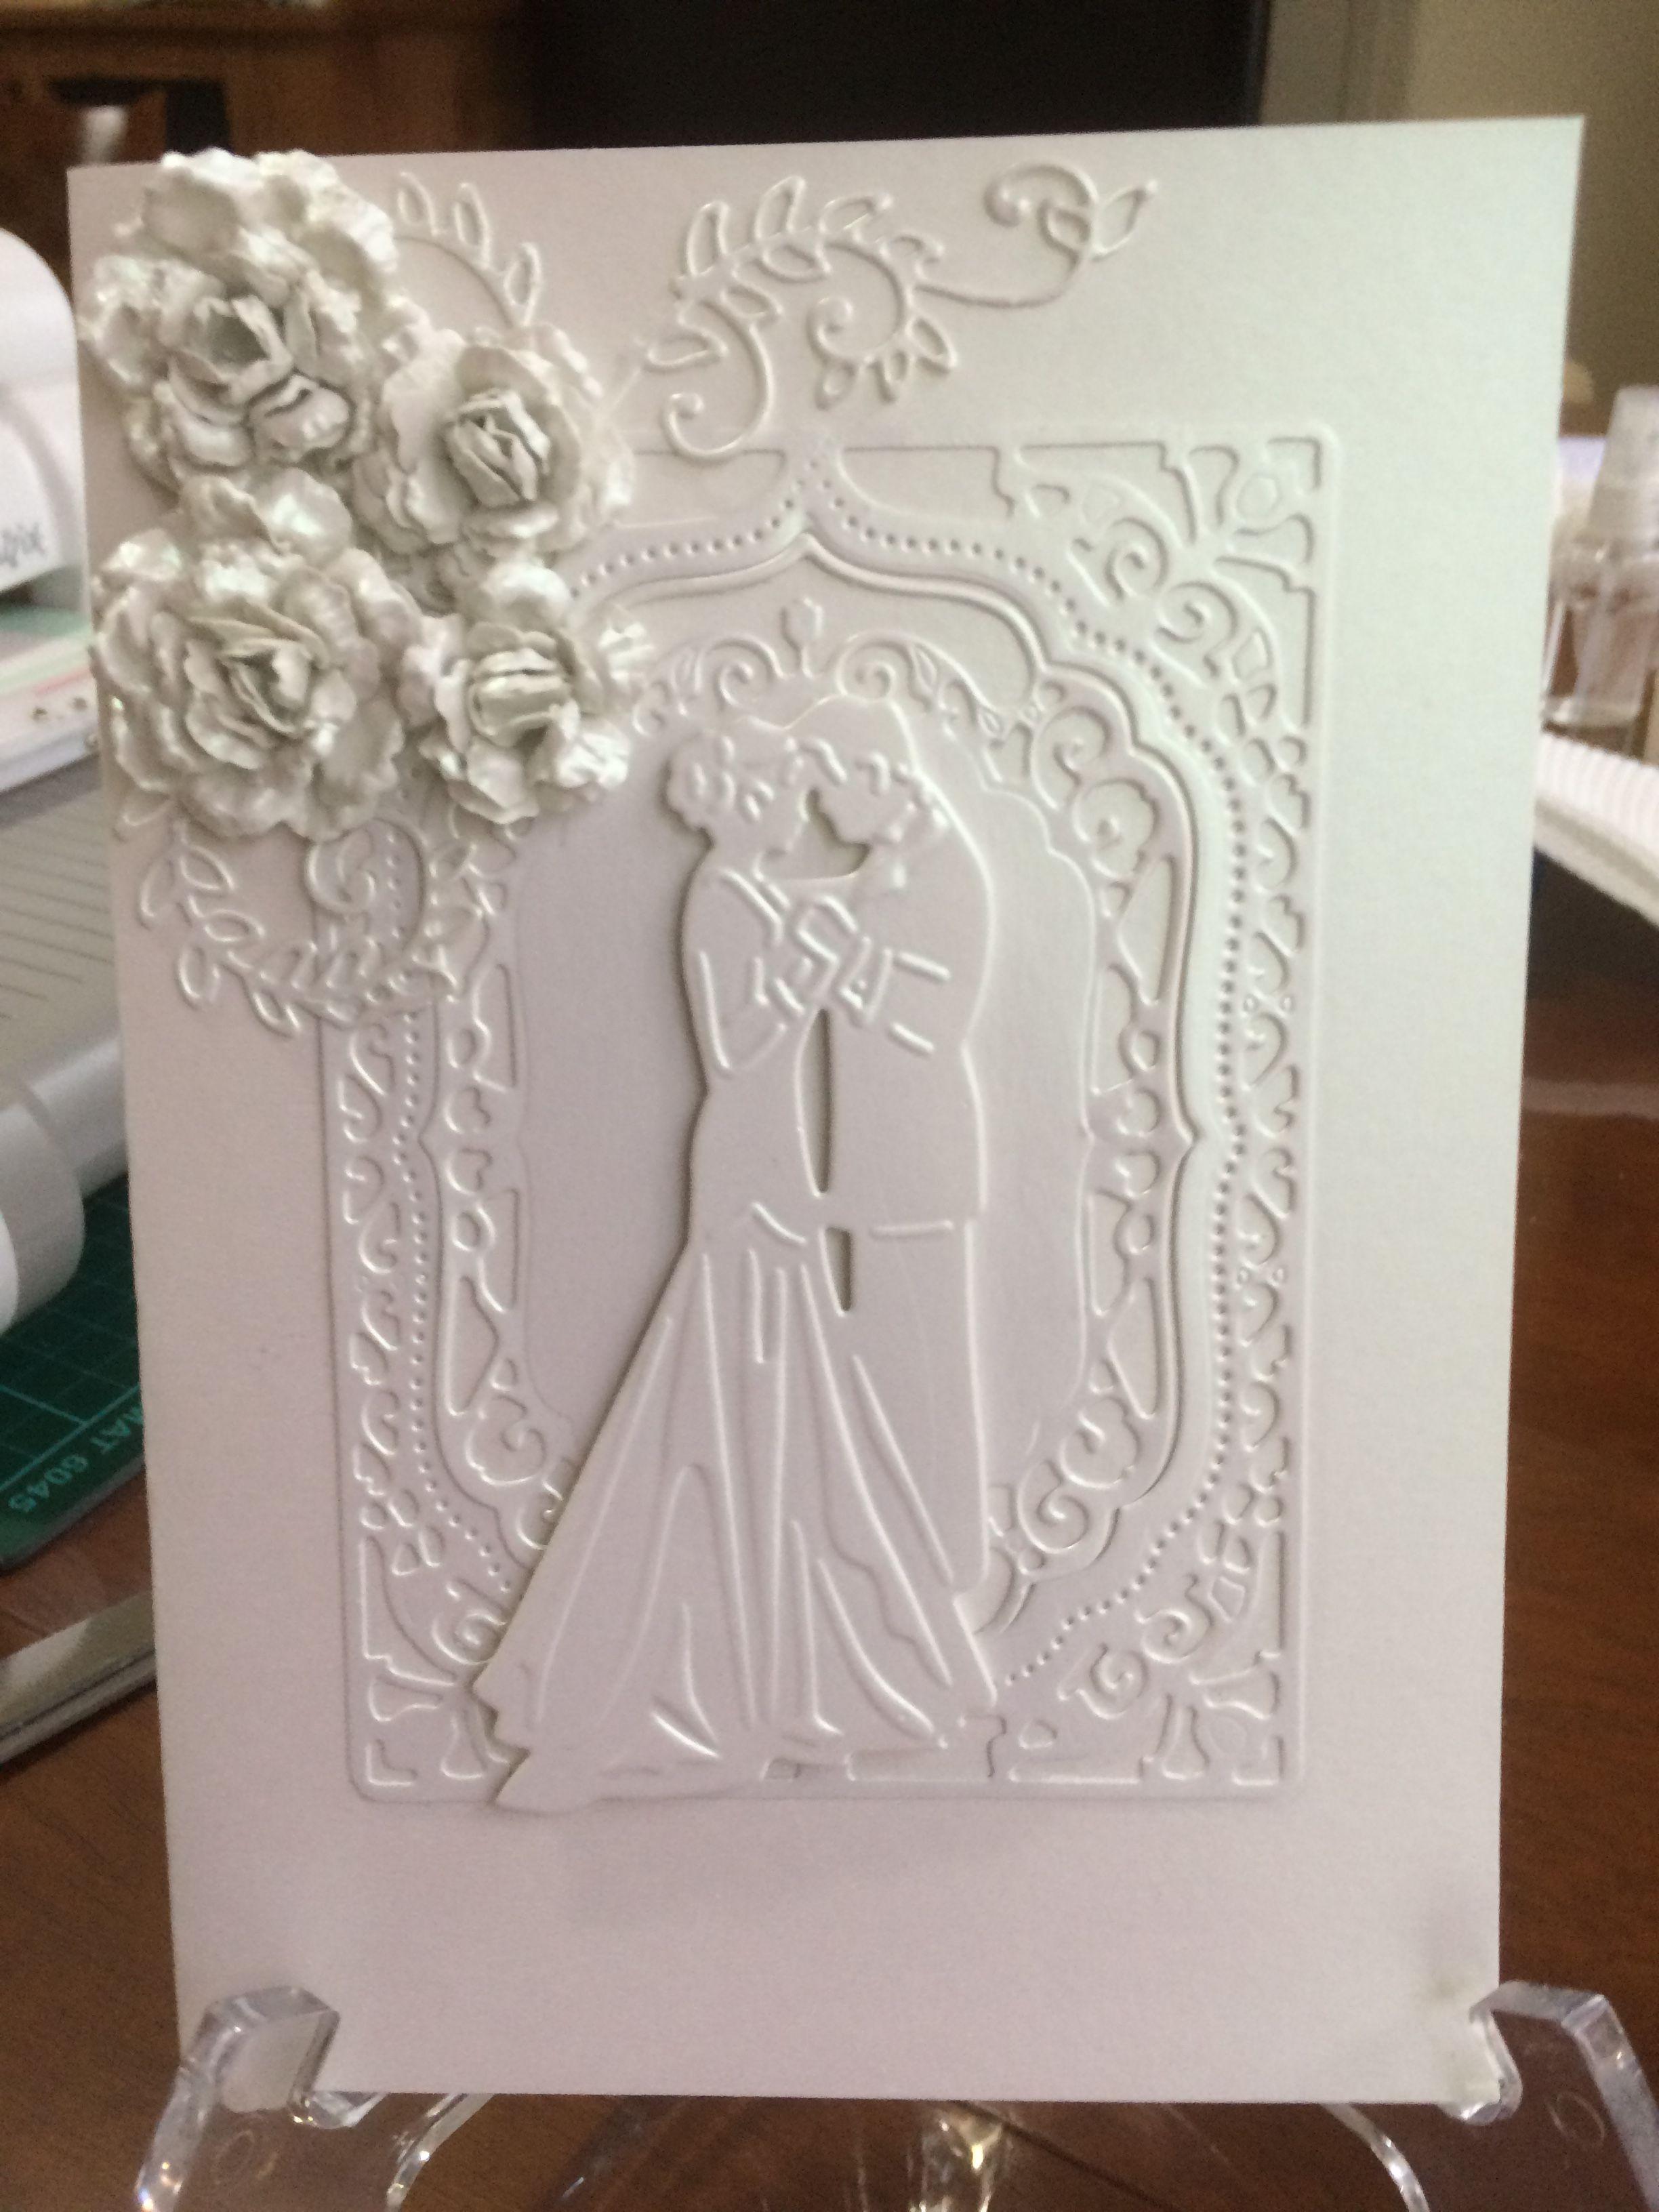 Pin By Vyvian Mieszkowski On Hochzeitskarten Pinterest Karten